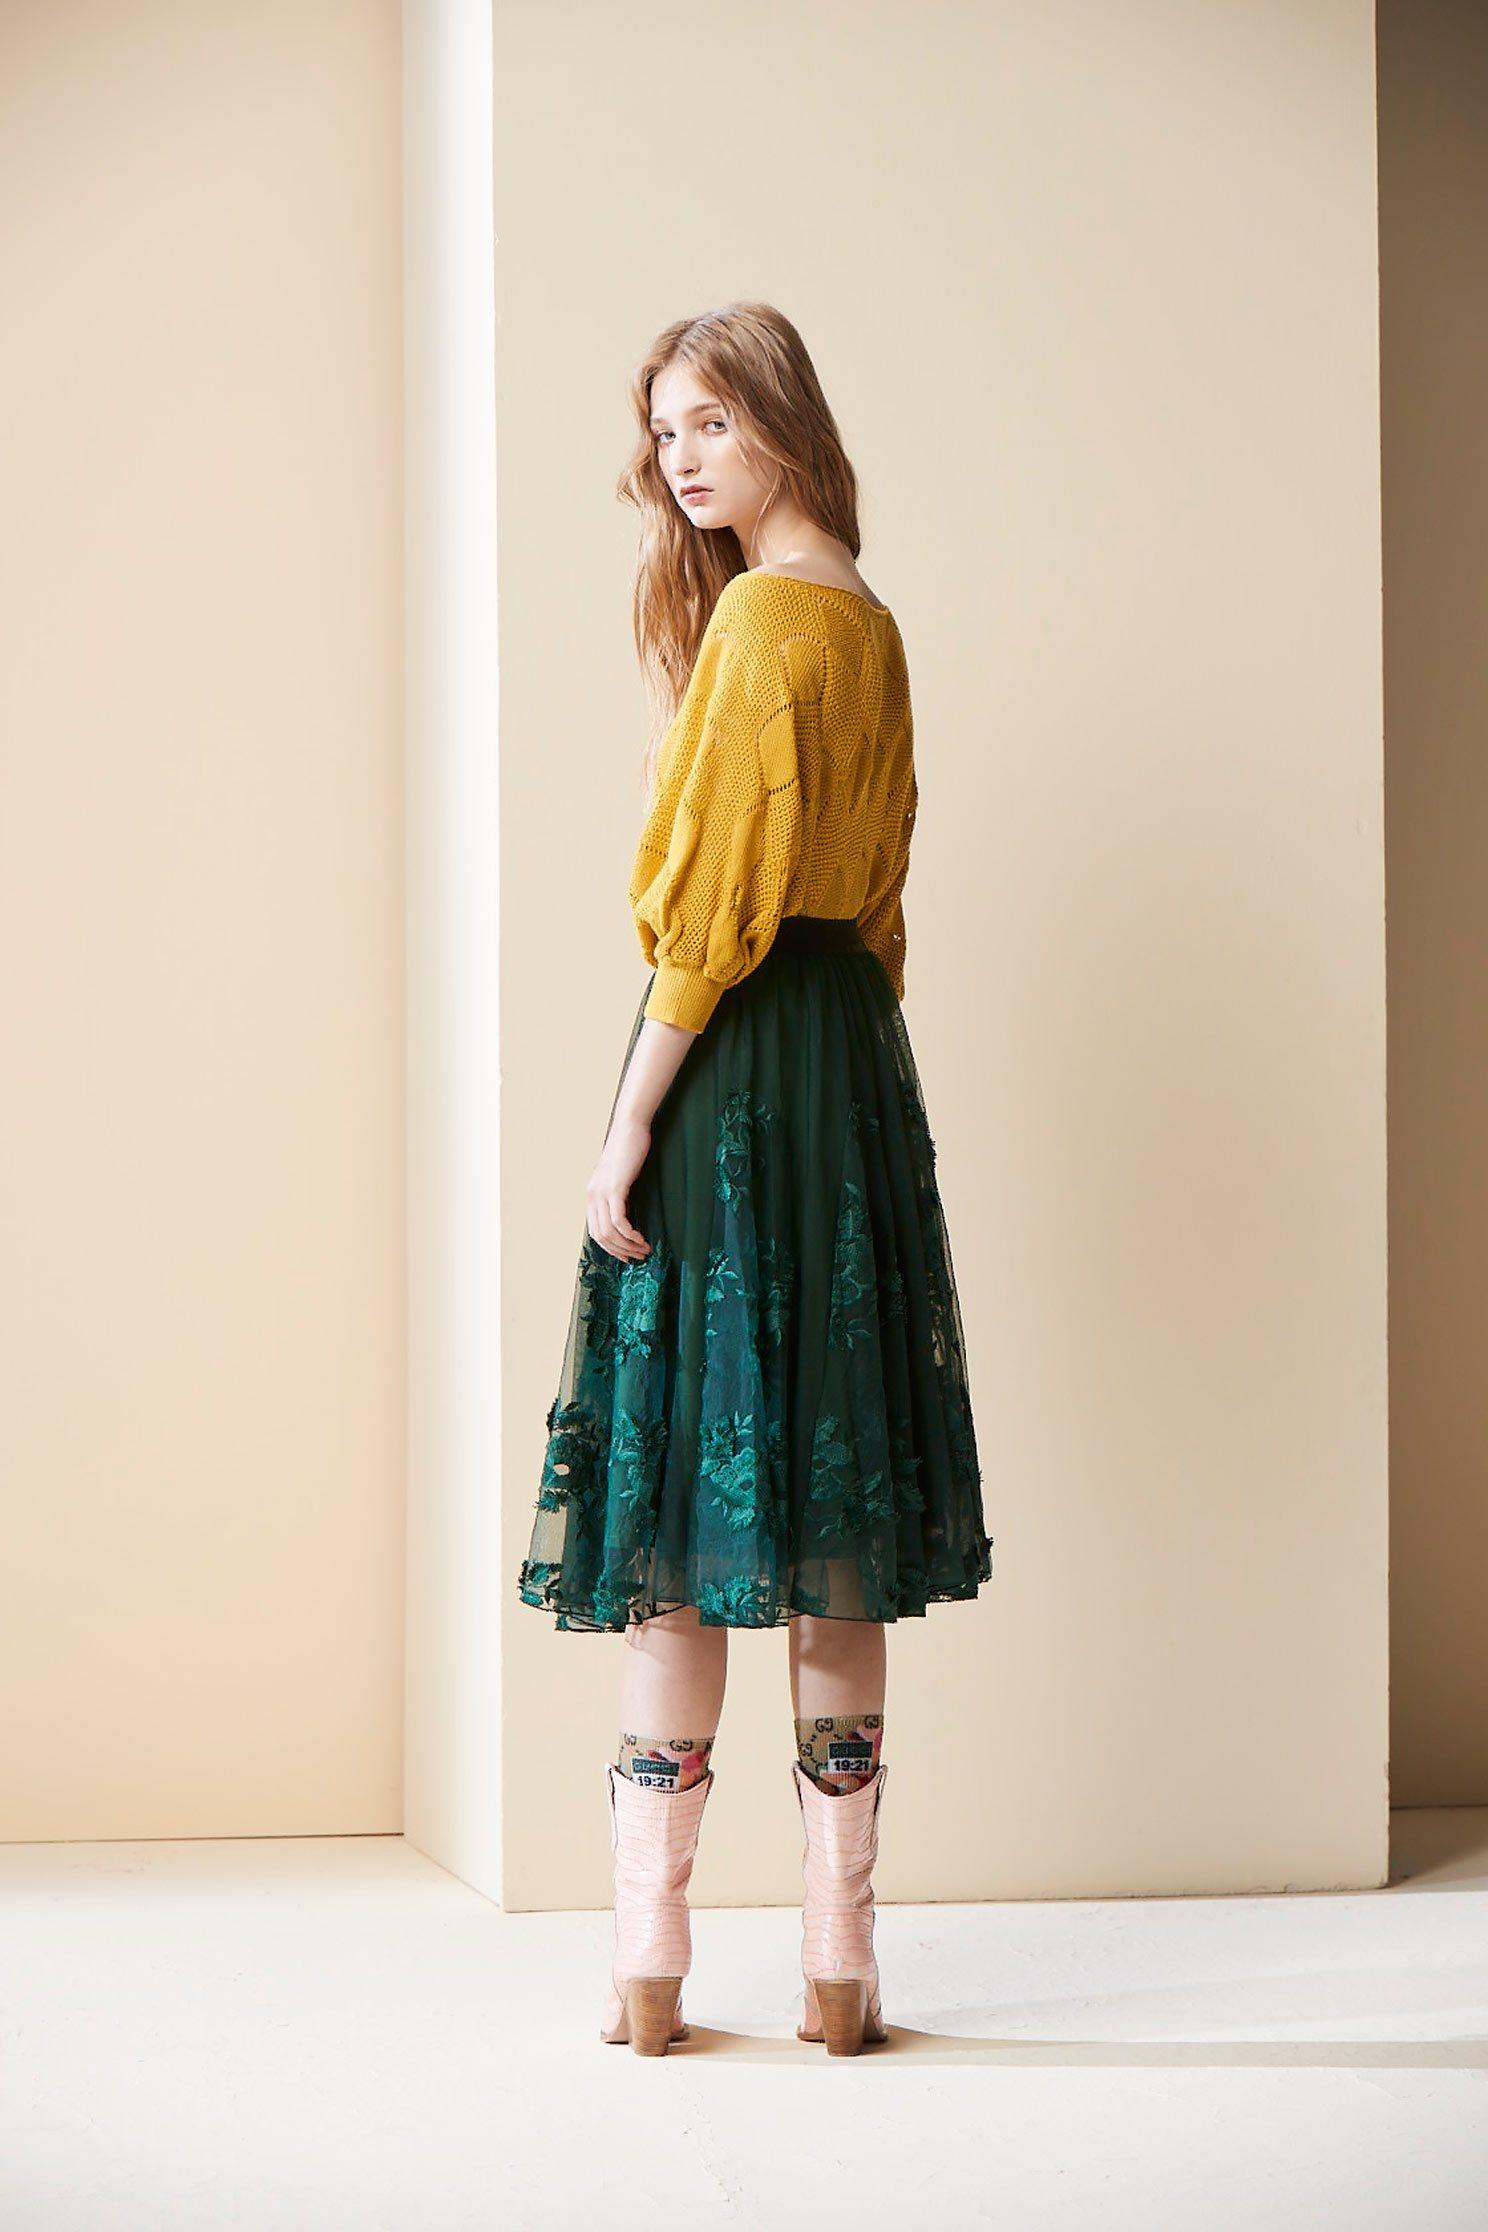 Knitting lingge shirts,offshouldertop,top,offshouldertop,watersigns,knitting,knittedtop,knittedtop,longsleevetop